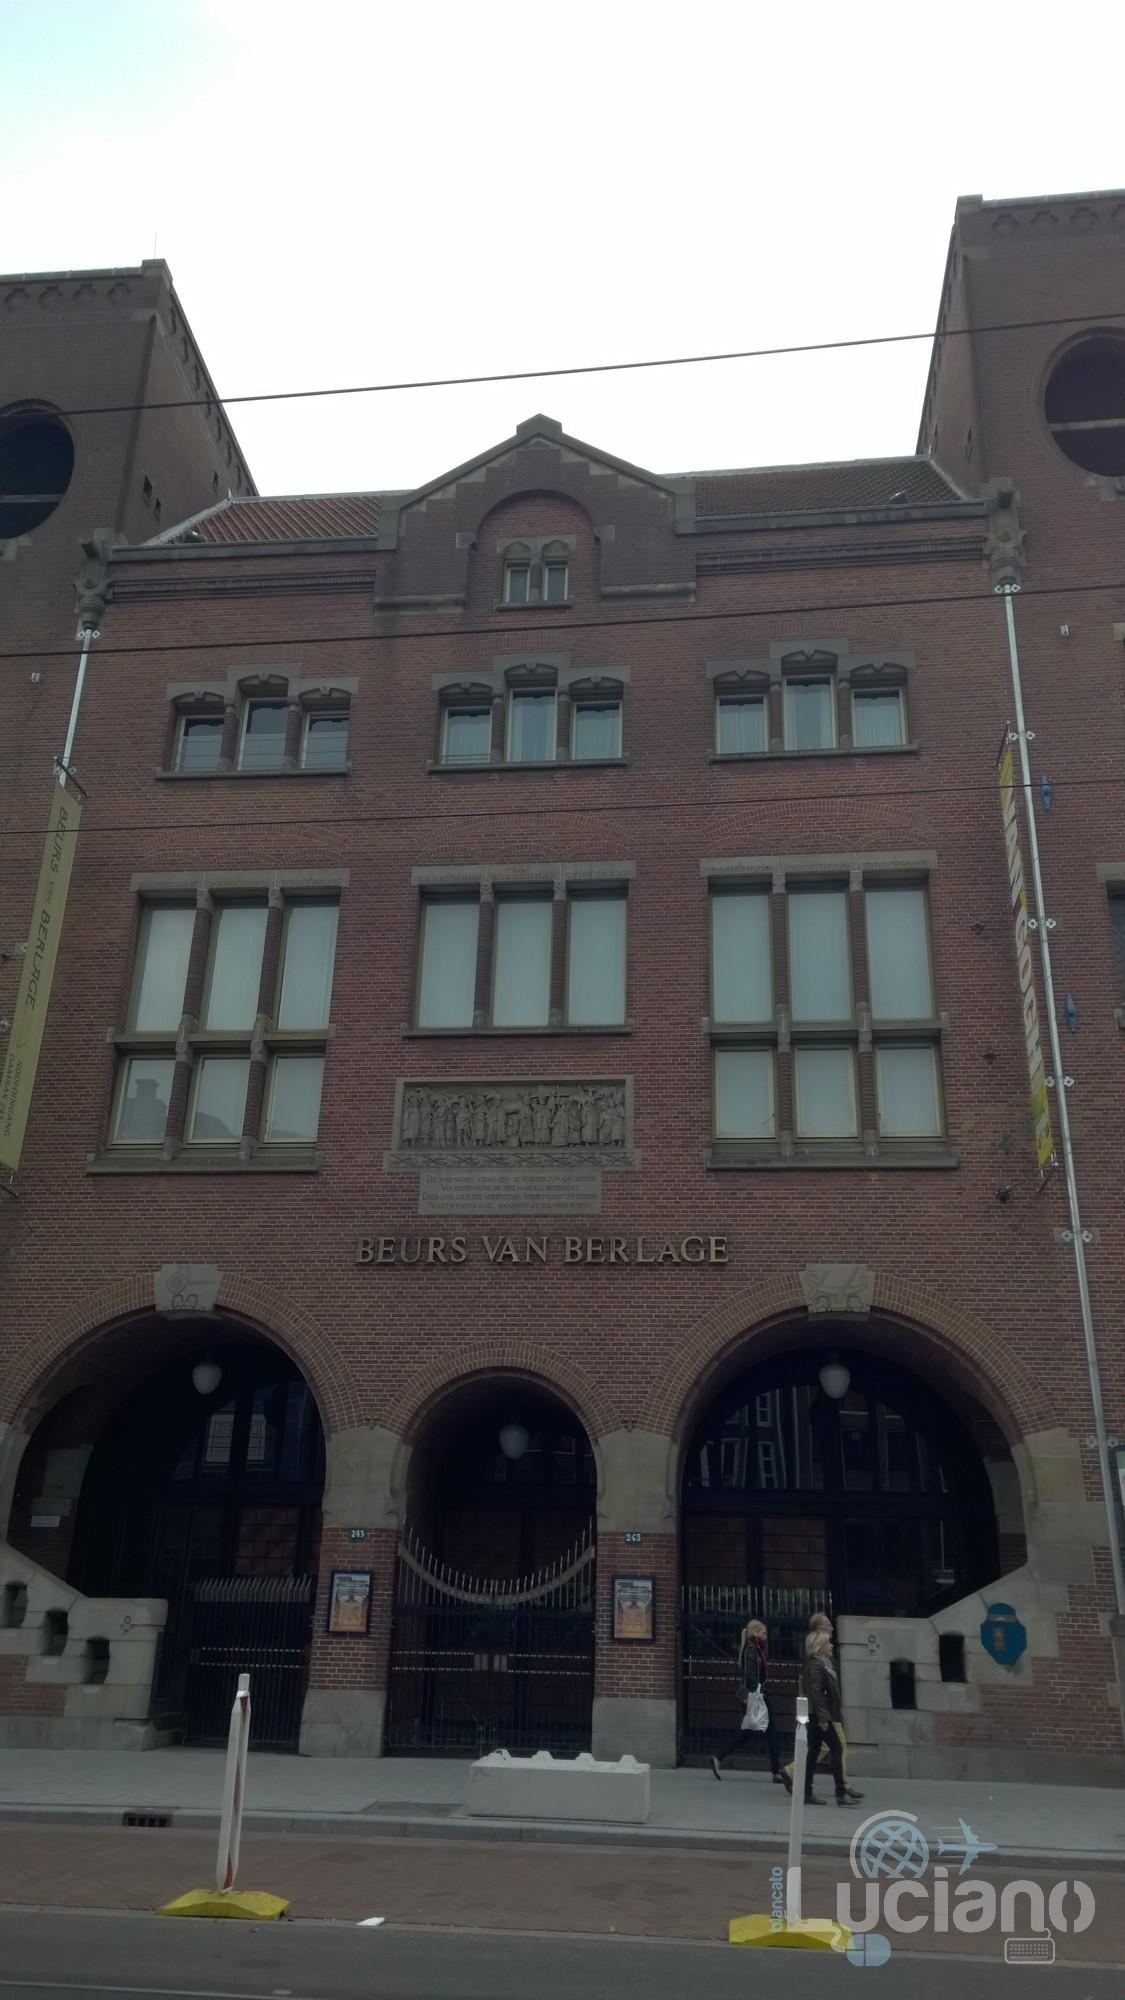 amsterdam-2014-vueling-lucianoblancatoit (71)